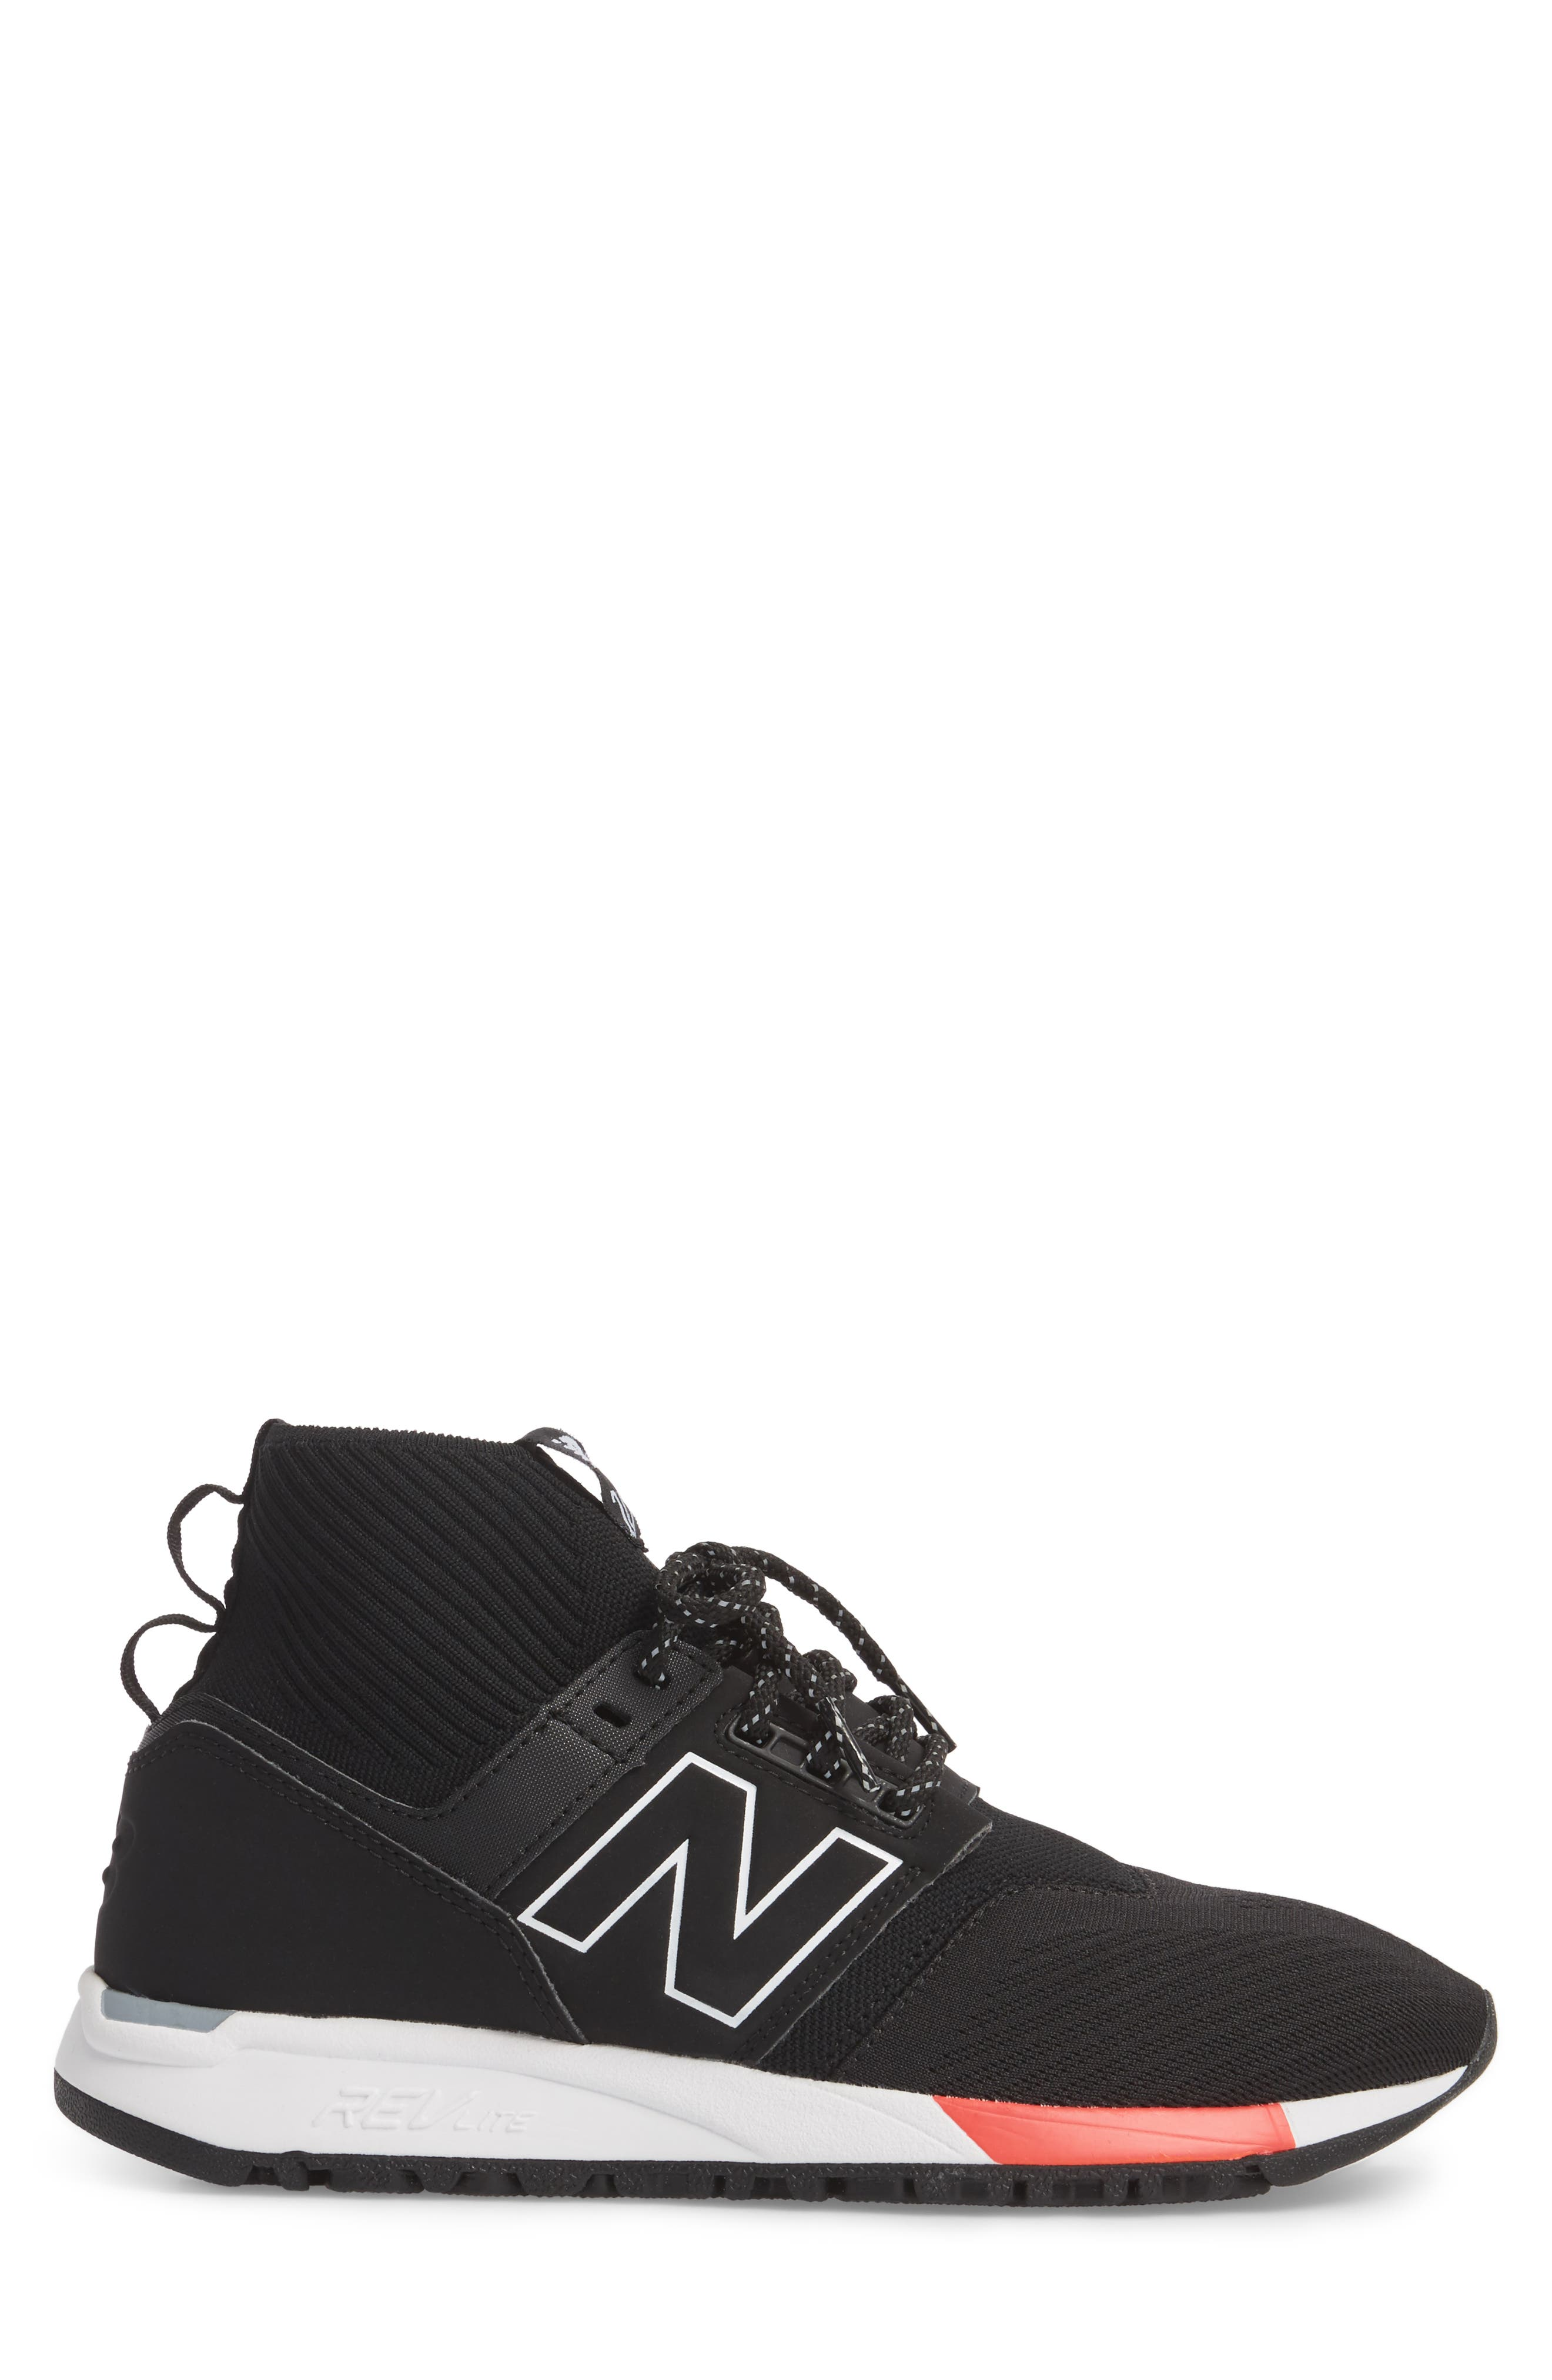 247 Mid Sneaker,                             Alternate thumbnail 3, color,                             Black